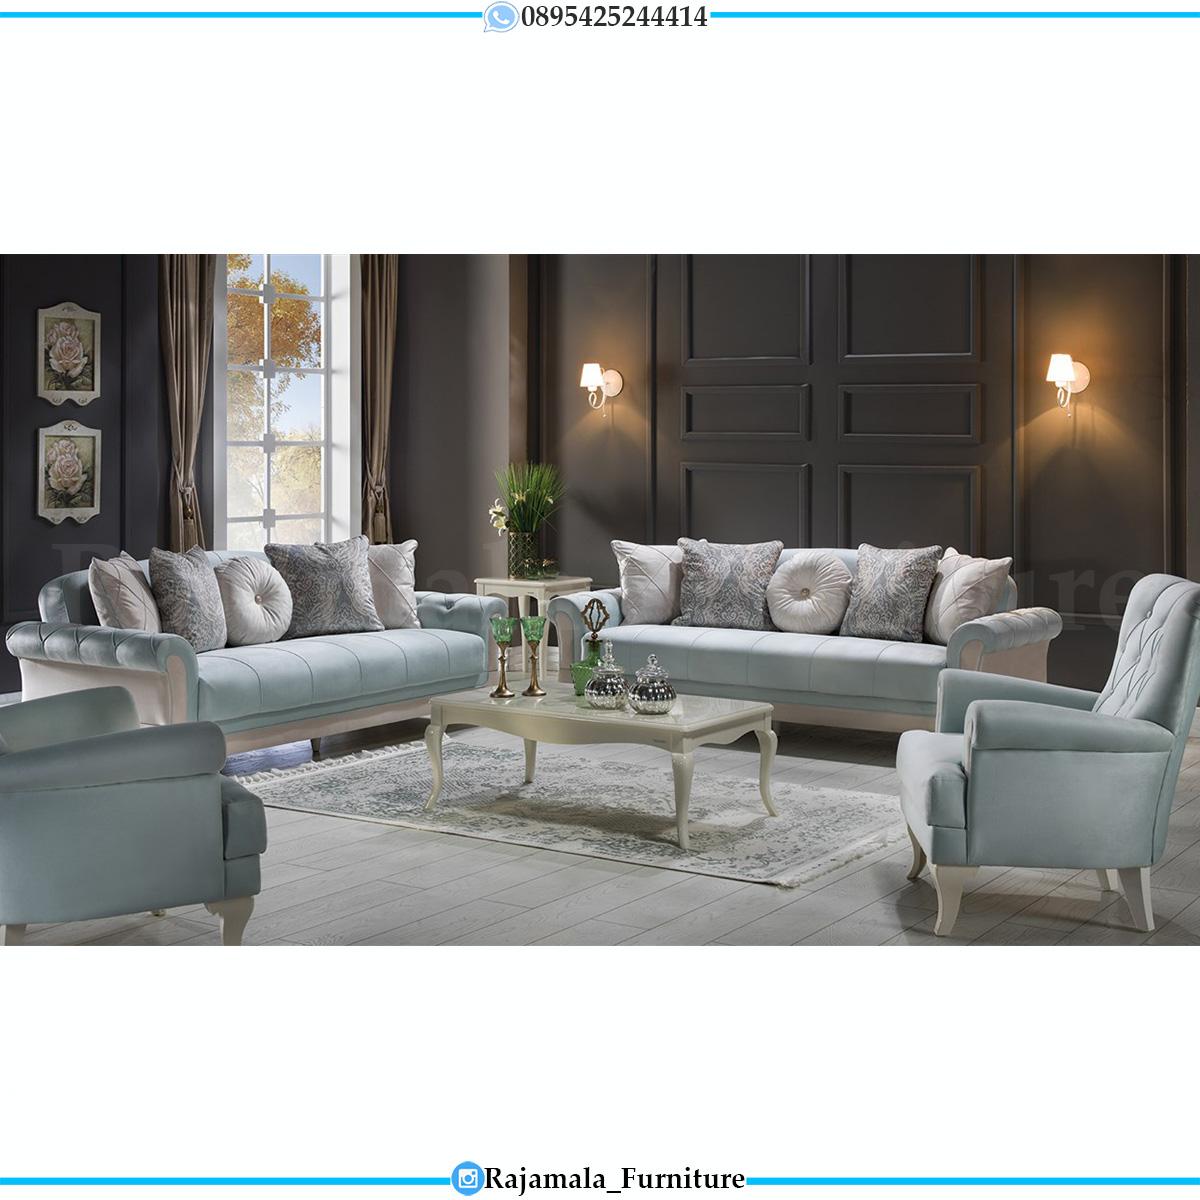 Set Sofa Minimalis Jepara Soft Beludru Fabric Blue Sky Color RM-0740